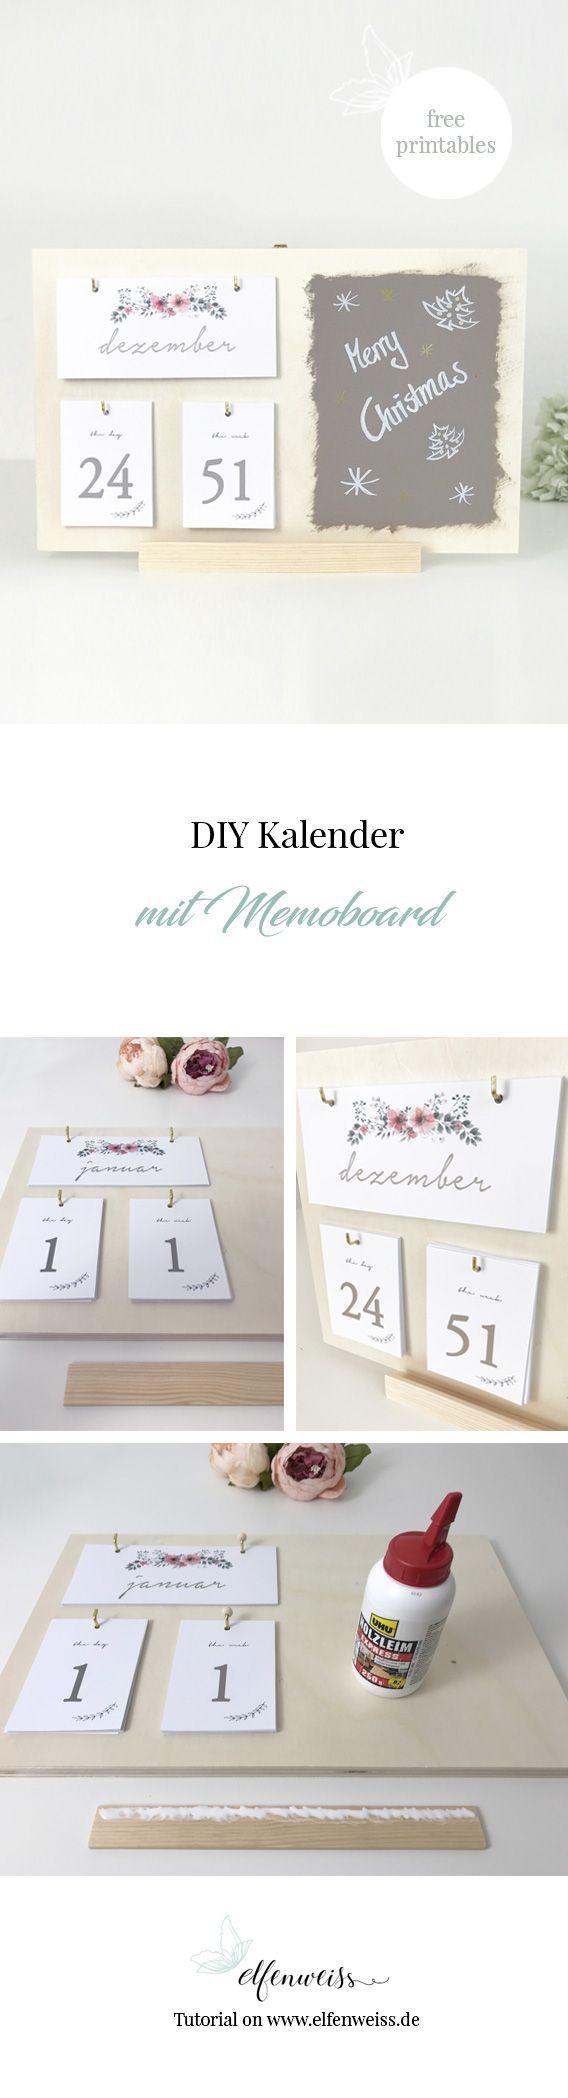 DIY Kalender 2018 * free printables* {Create yourself a merry little christmas} ⋆ elfenweiss